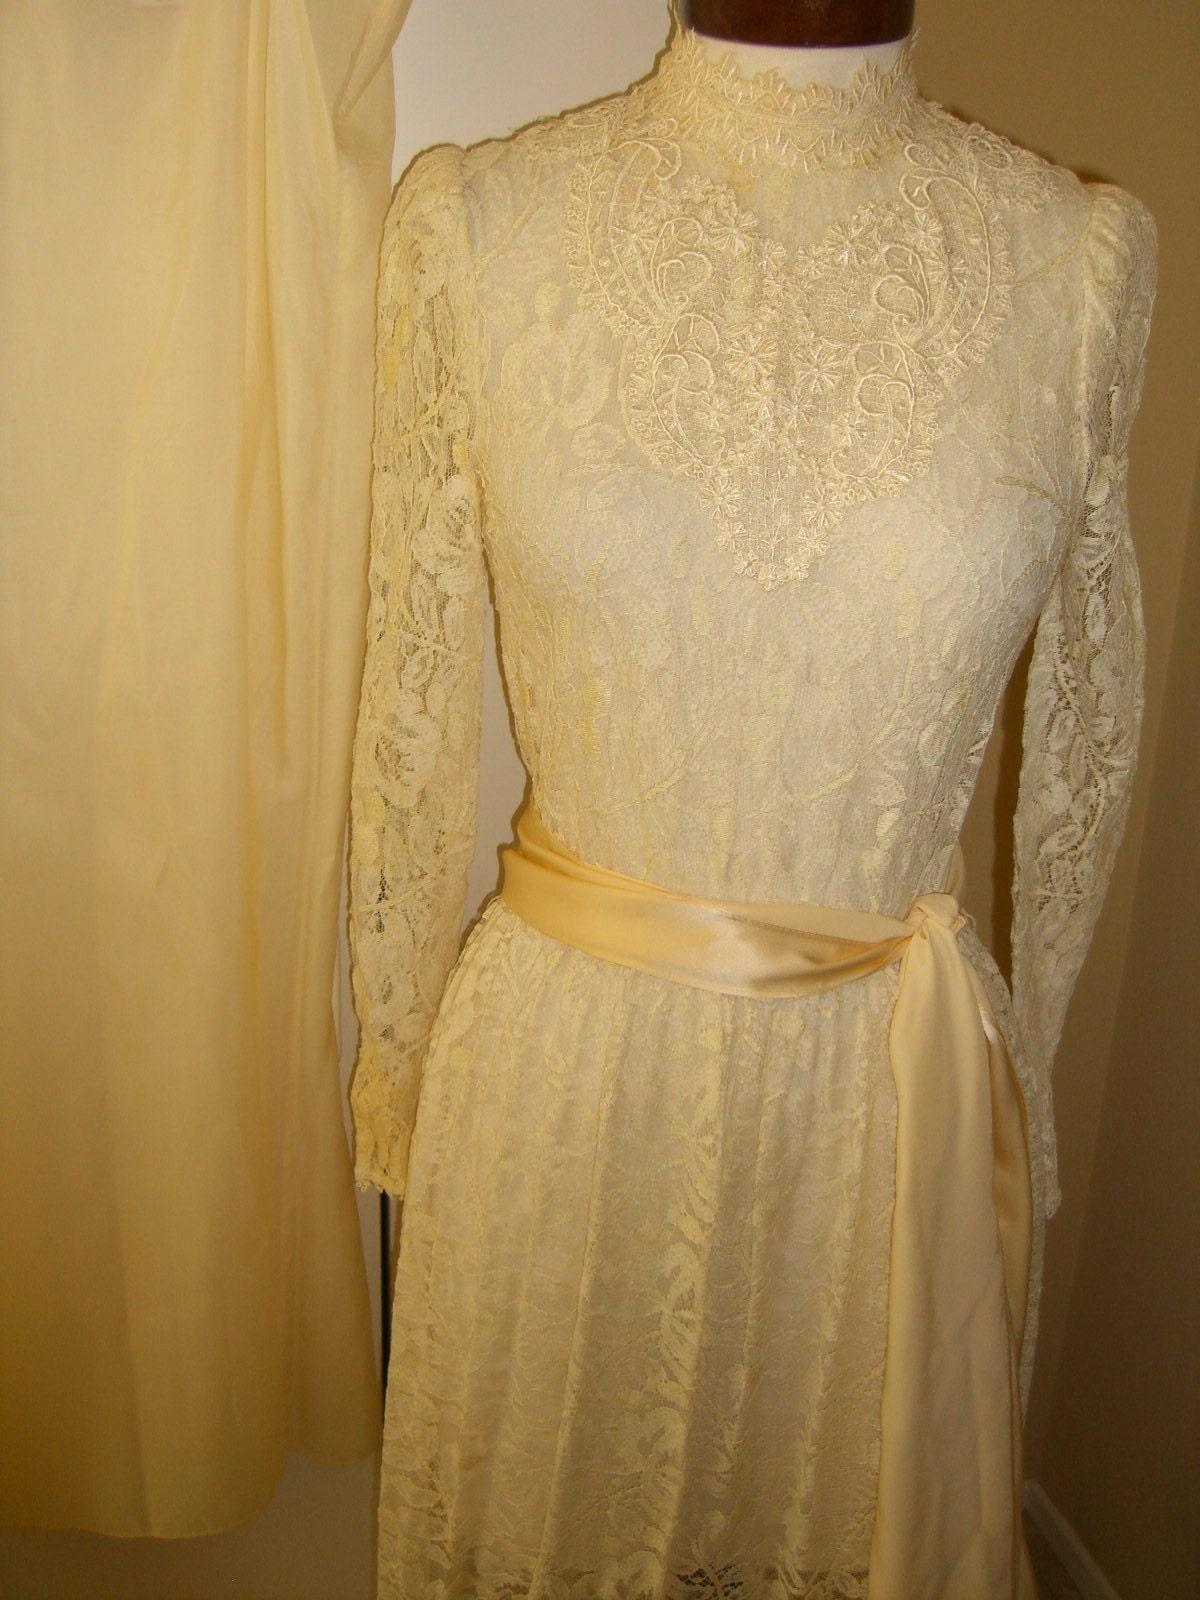 Vintage Hippie Lace Dress Wedding Dress Jessica McClintock